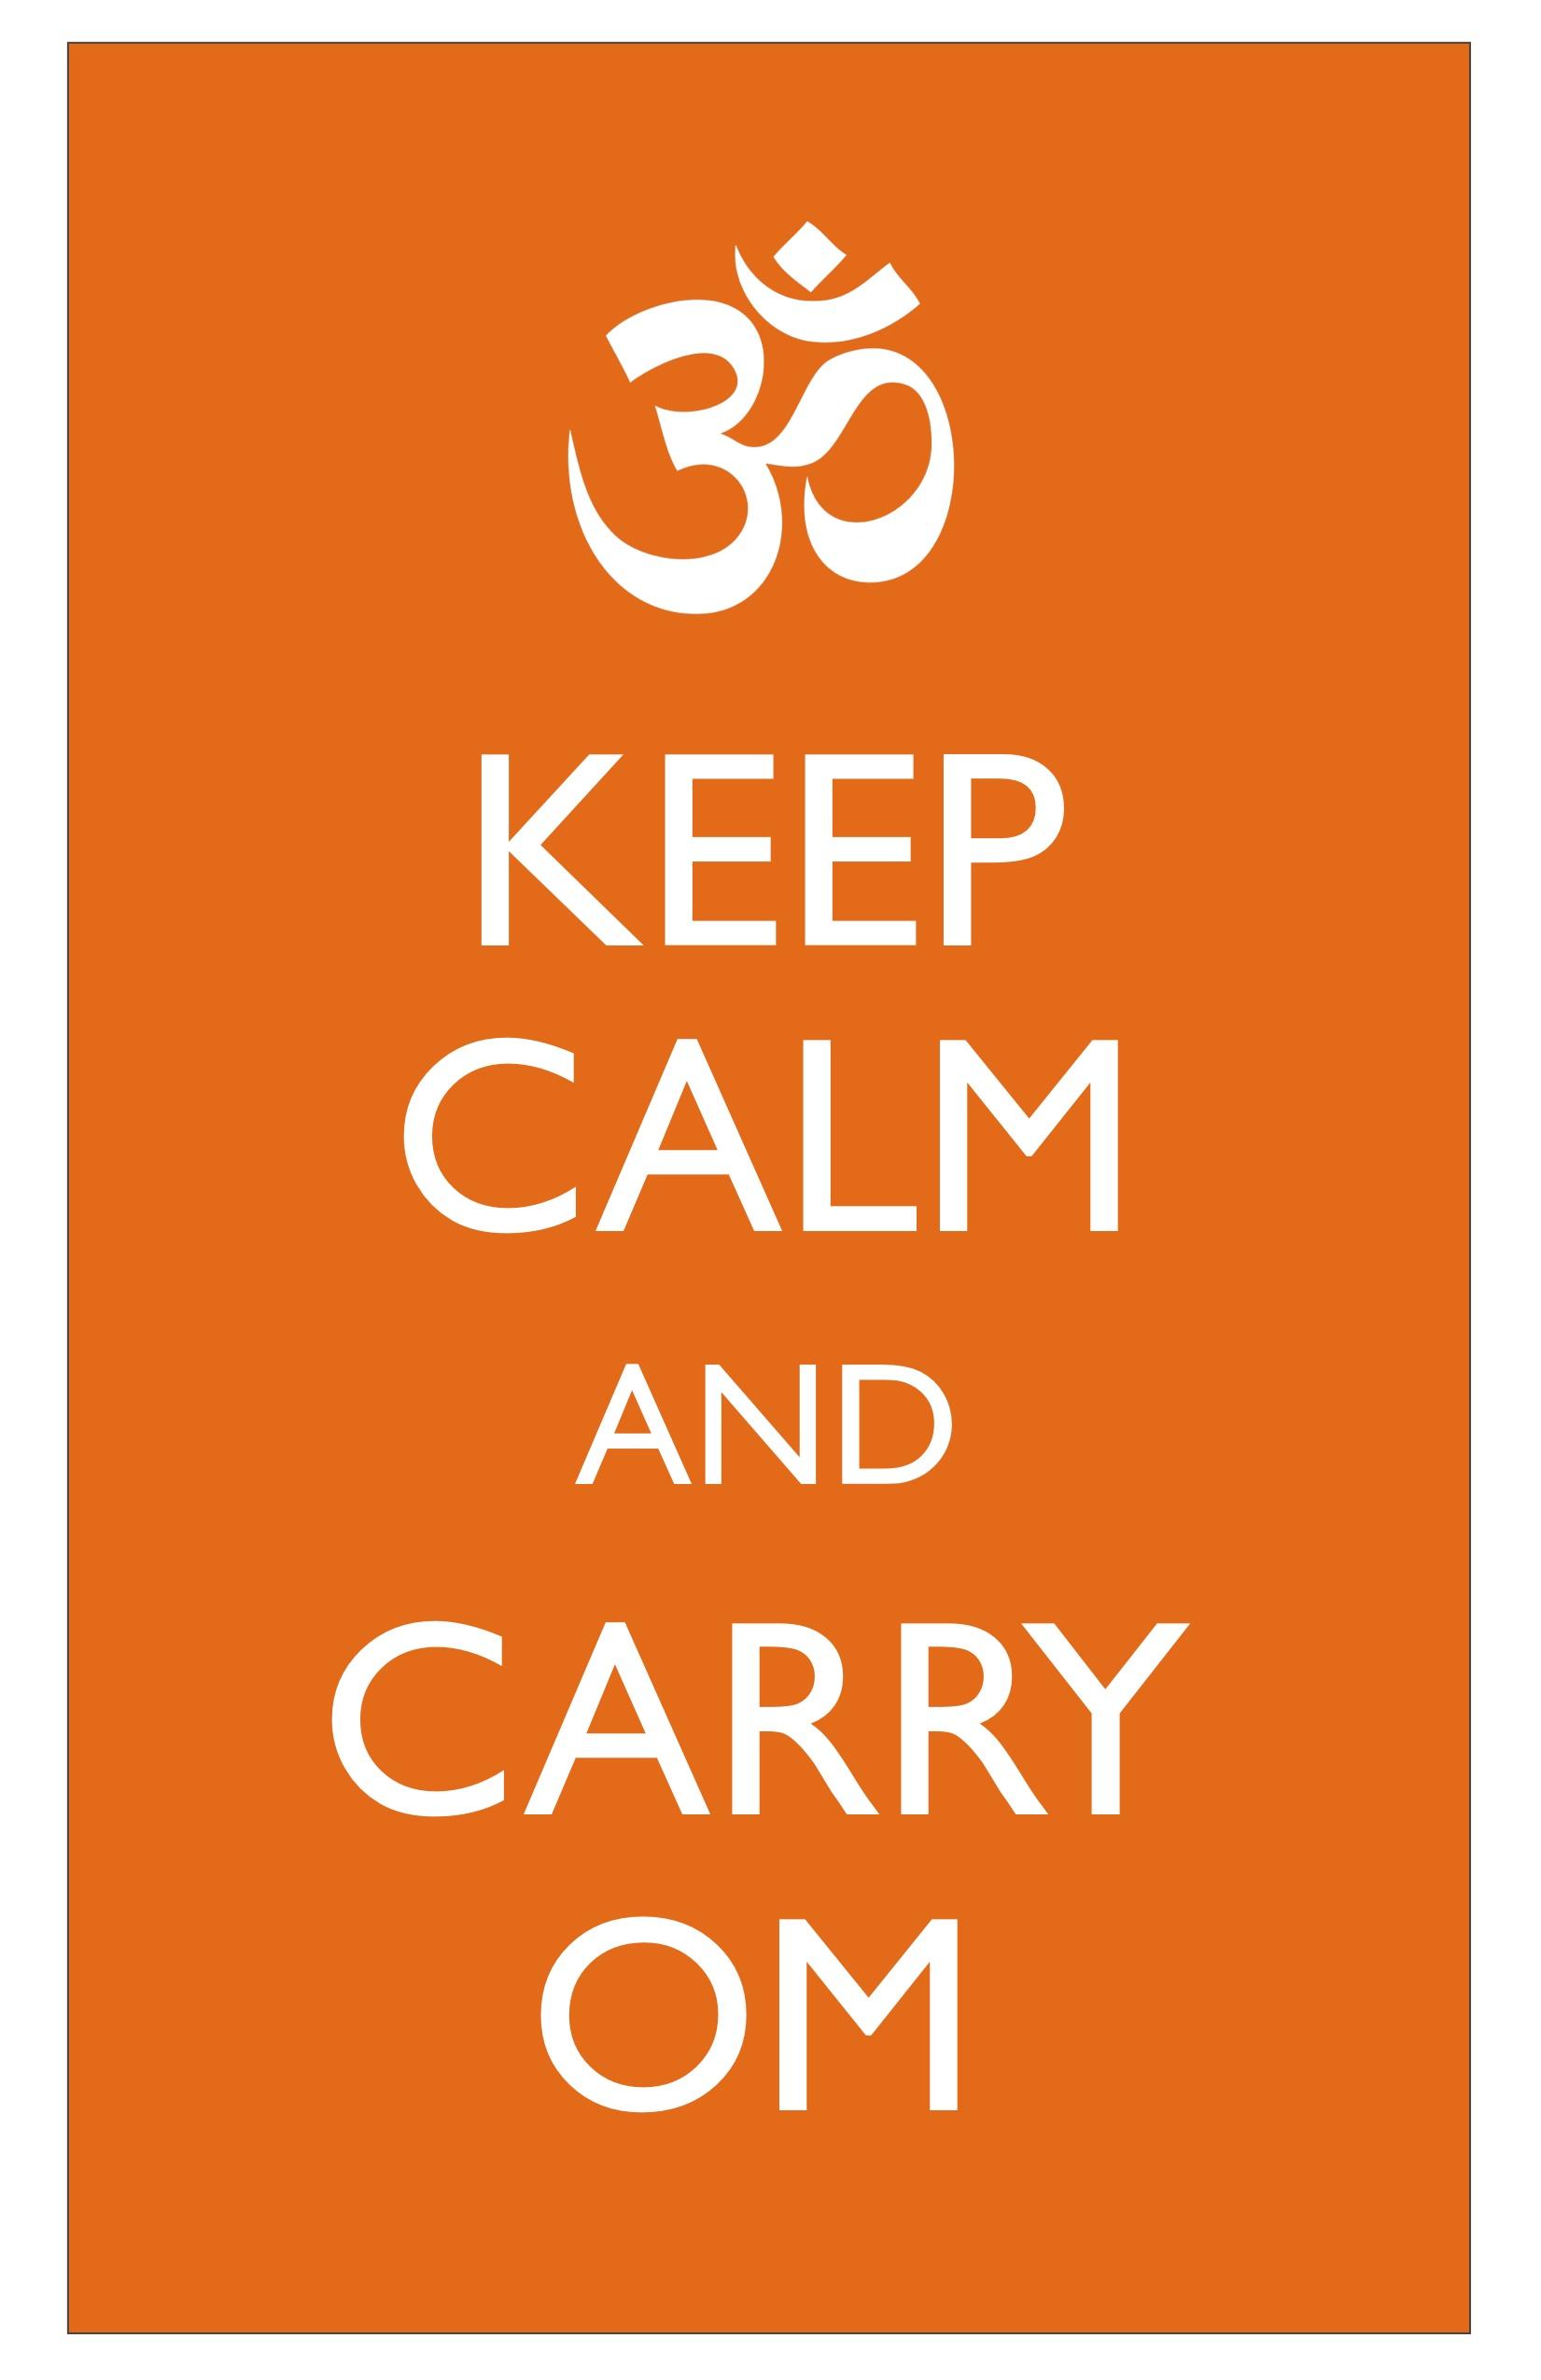 Keep Calm and Carry Om-Subway Art – Om She Said